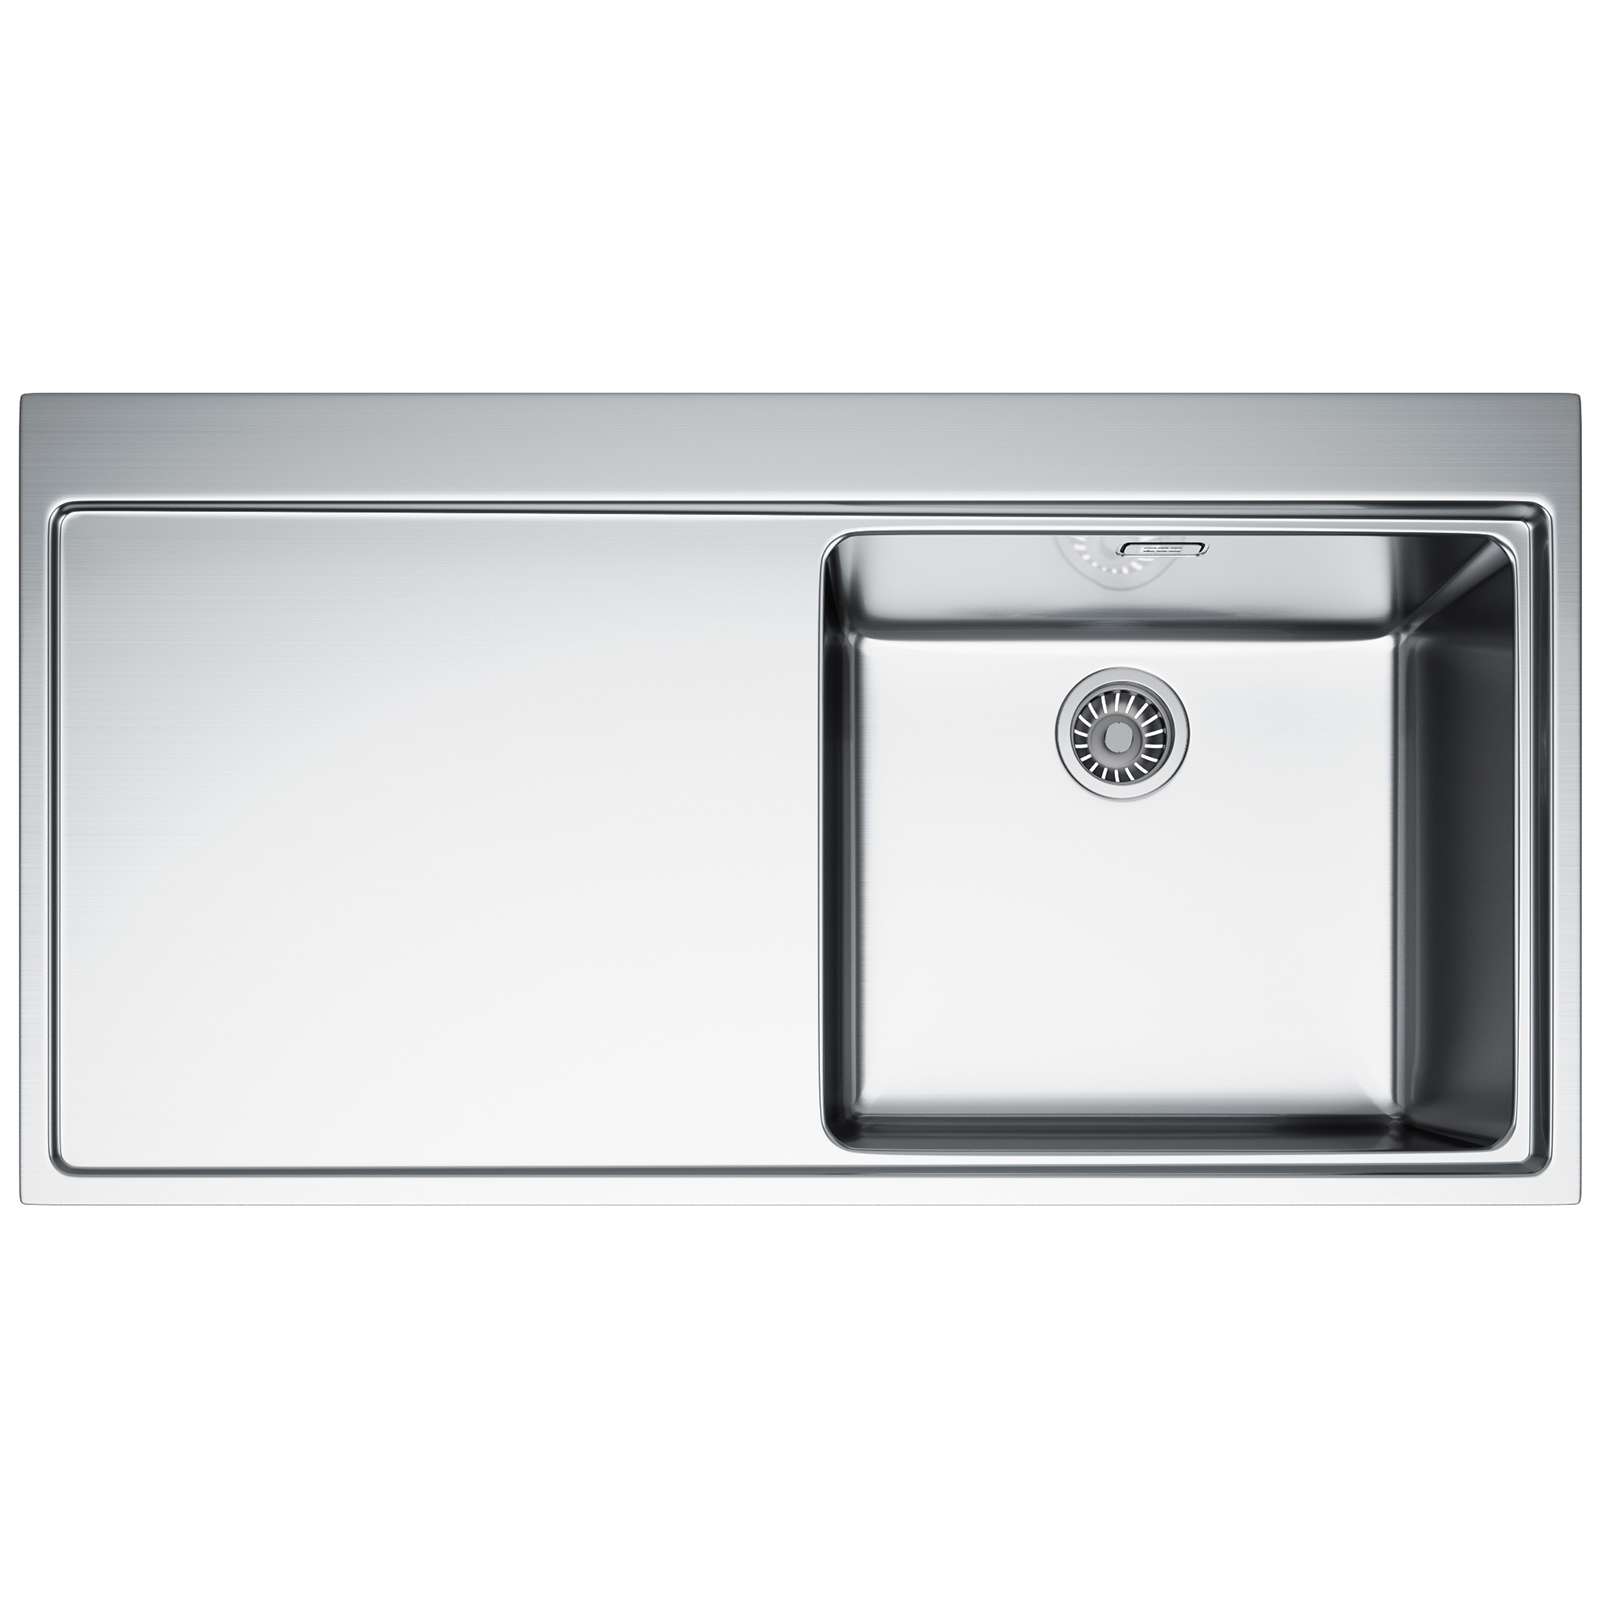 Franke Mythos Sink Stainless Steel : ... Franke Mythos MMX 211 DP - Stainless Steel Left Hand Drainer Sink And